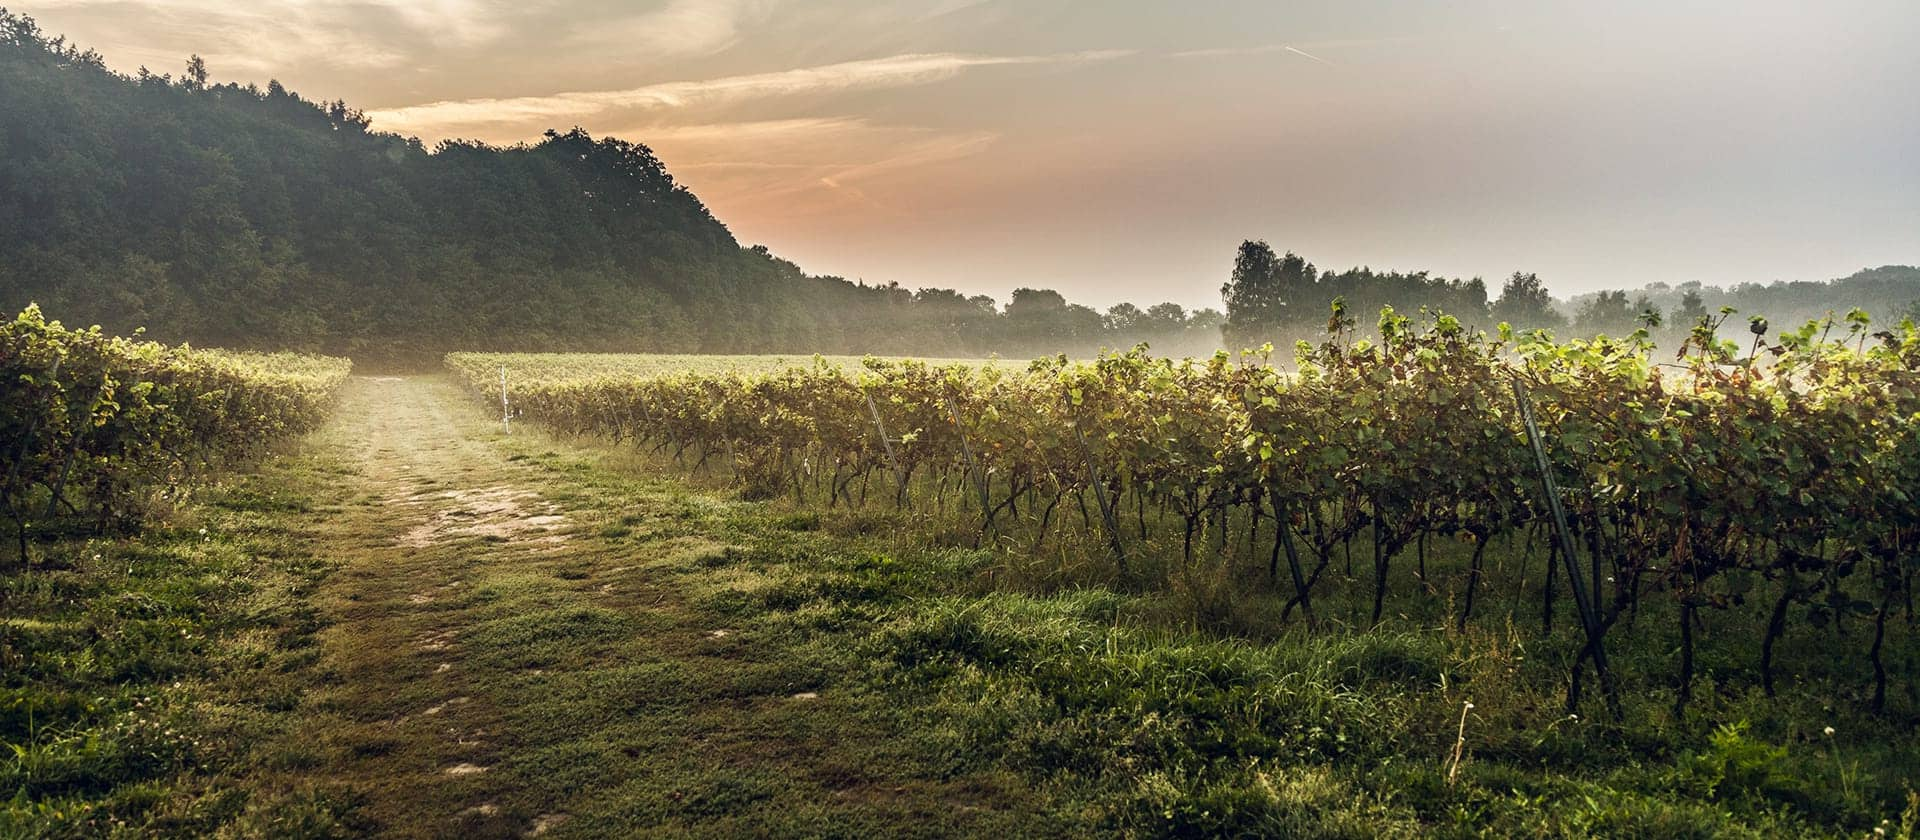 Winnica (Vineyard)